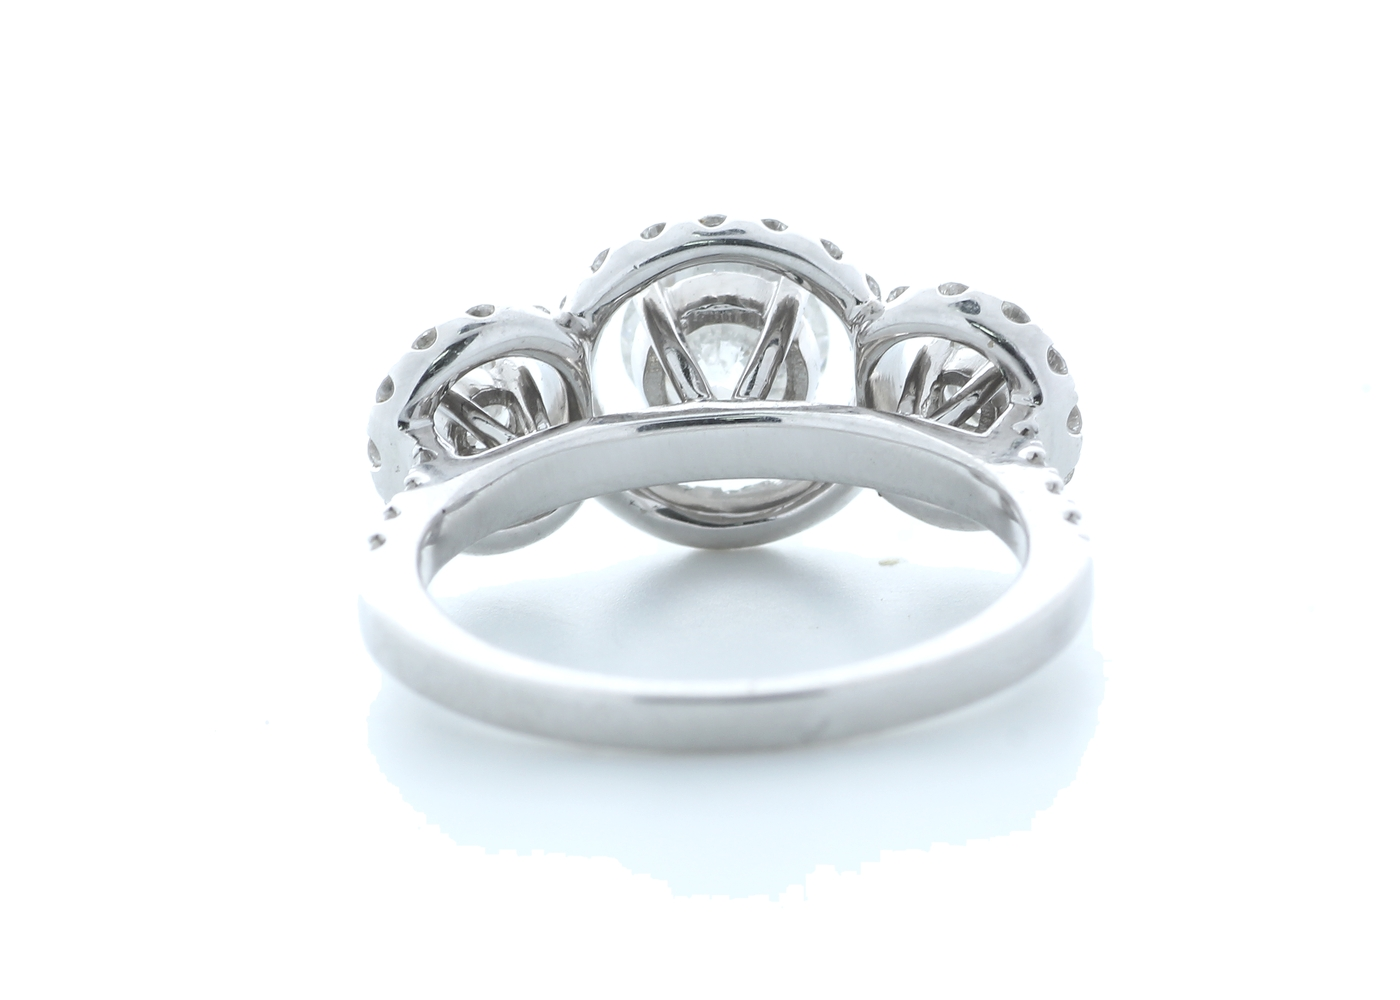 18ct White Gold Three Stone Halo Set Diamond Ring 1.91 Carats - Image 3 of 5